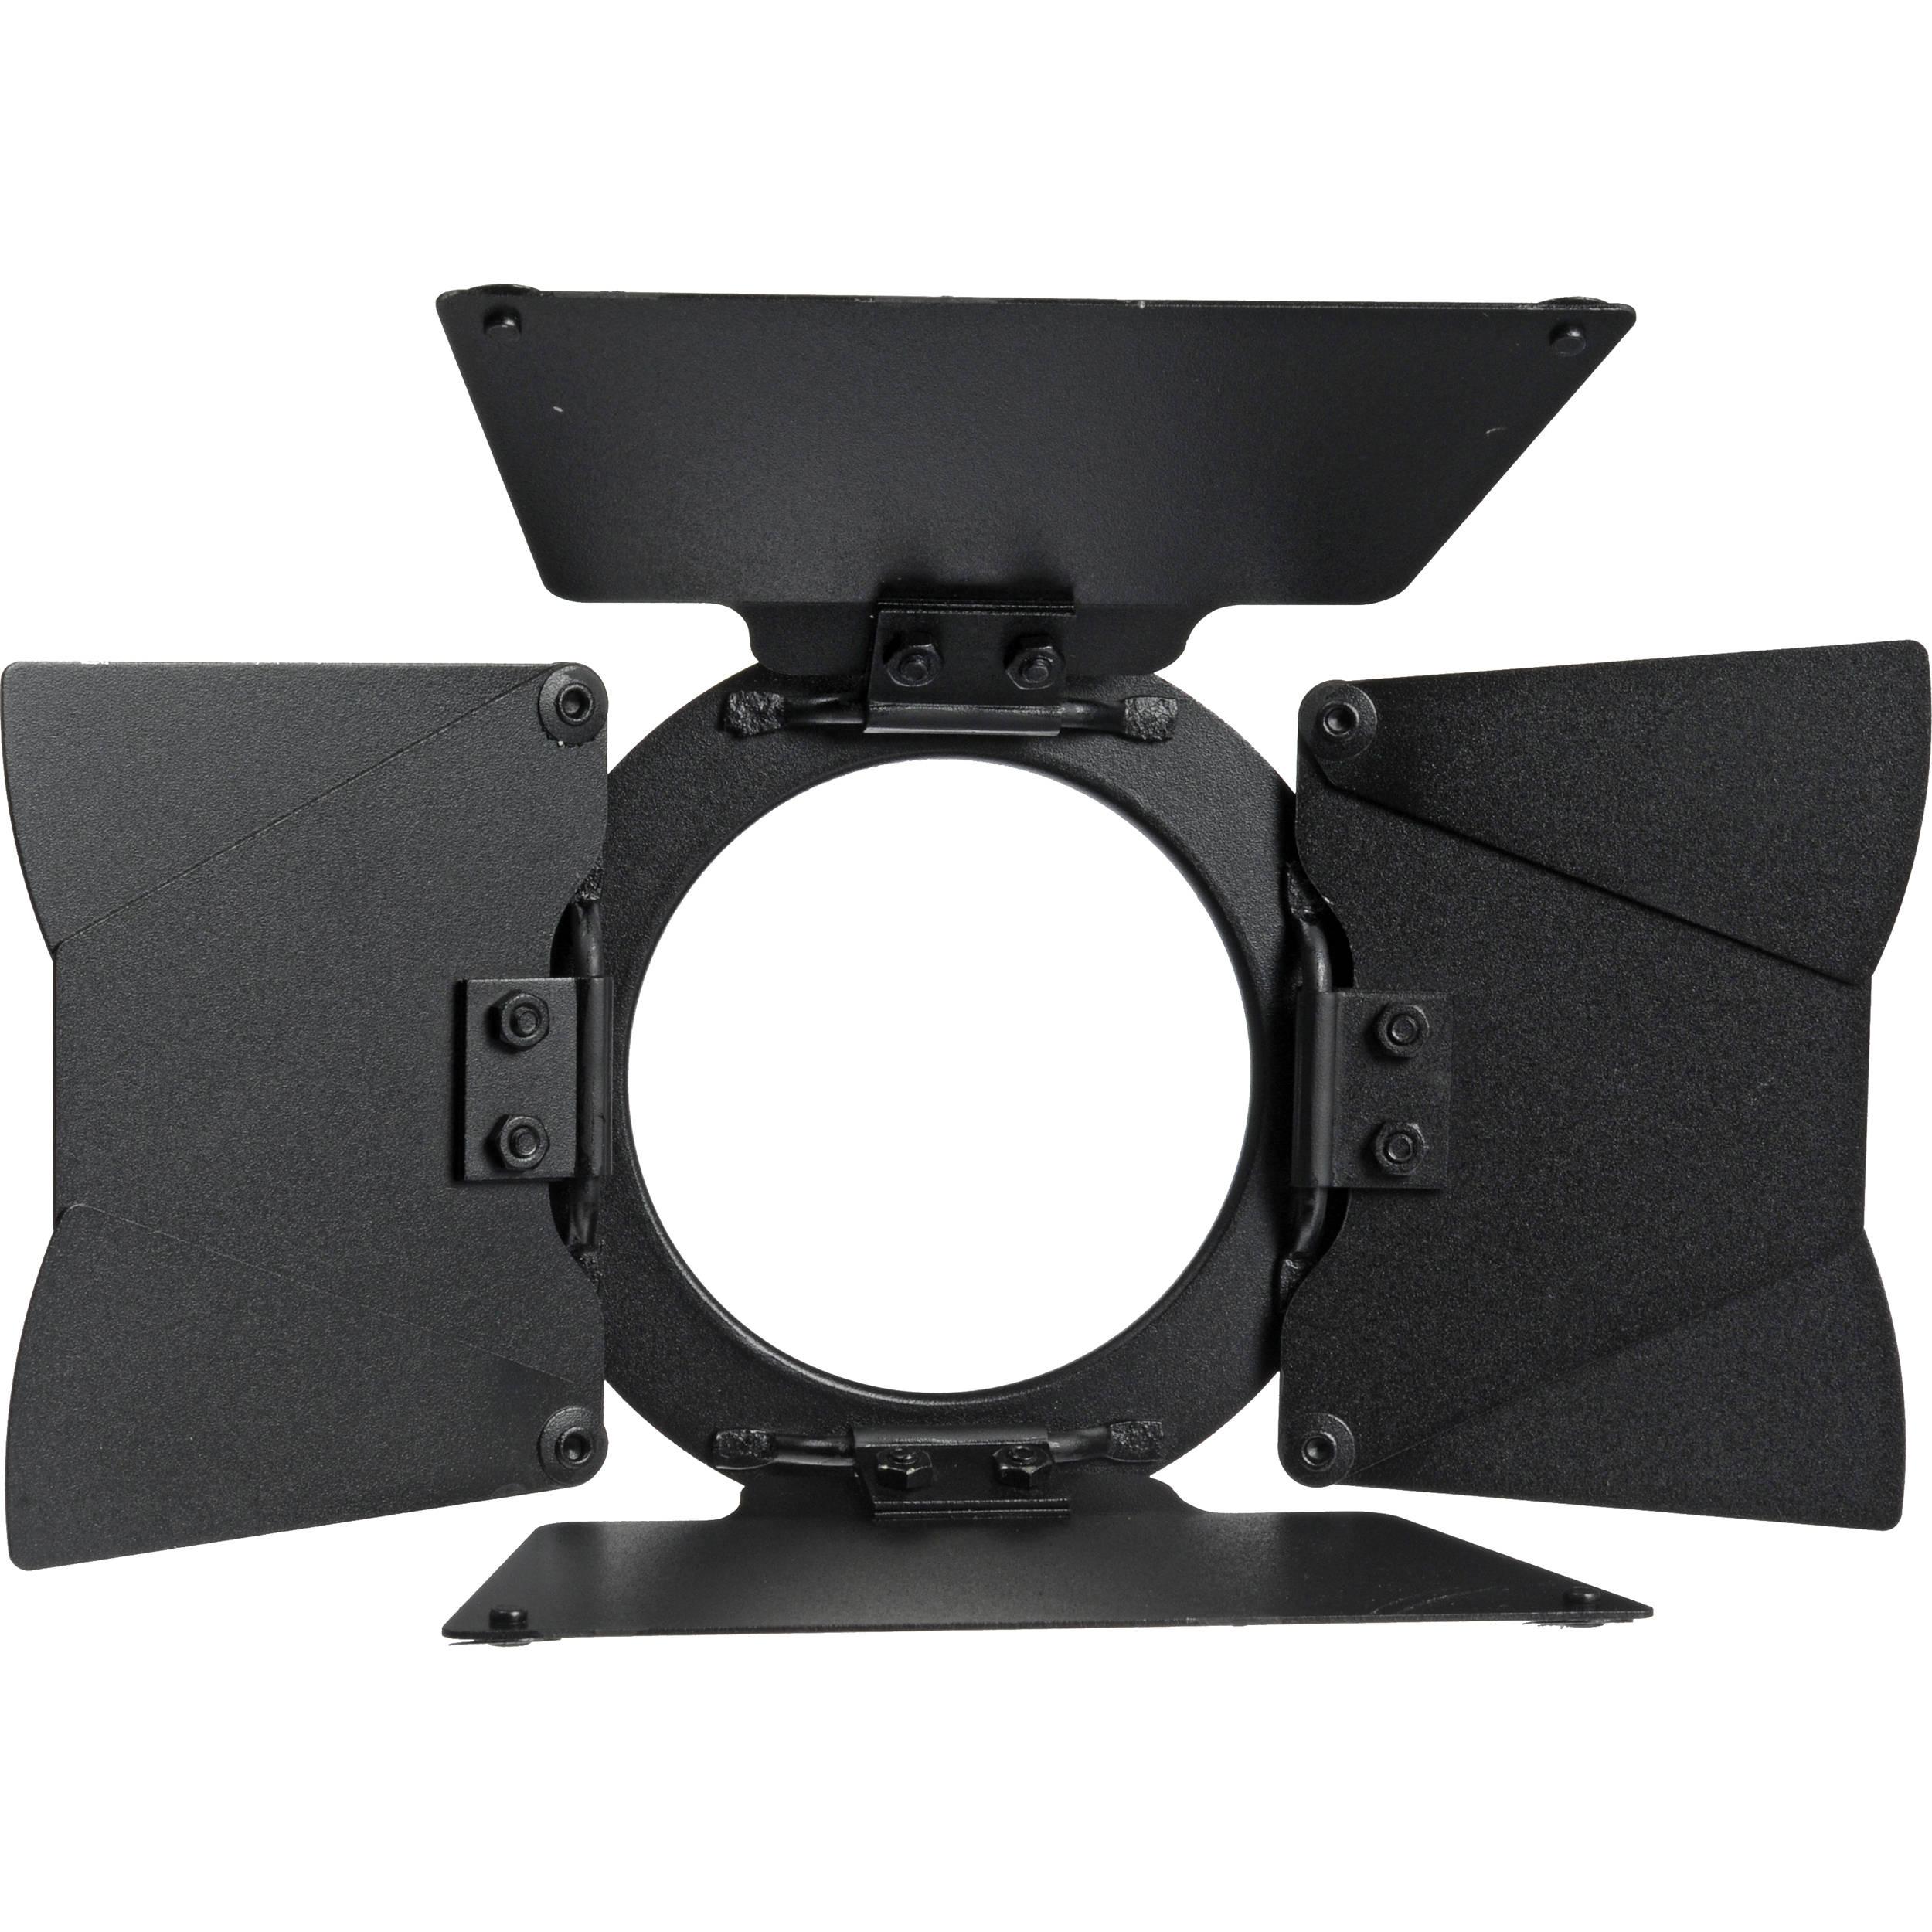 "dedolight 8 leaf barndoor set with gel clips (5 5\"") dbd8dedolight 8 leaf barndoor set with gel clips (5 5\"")"